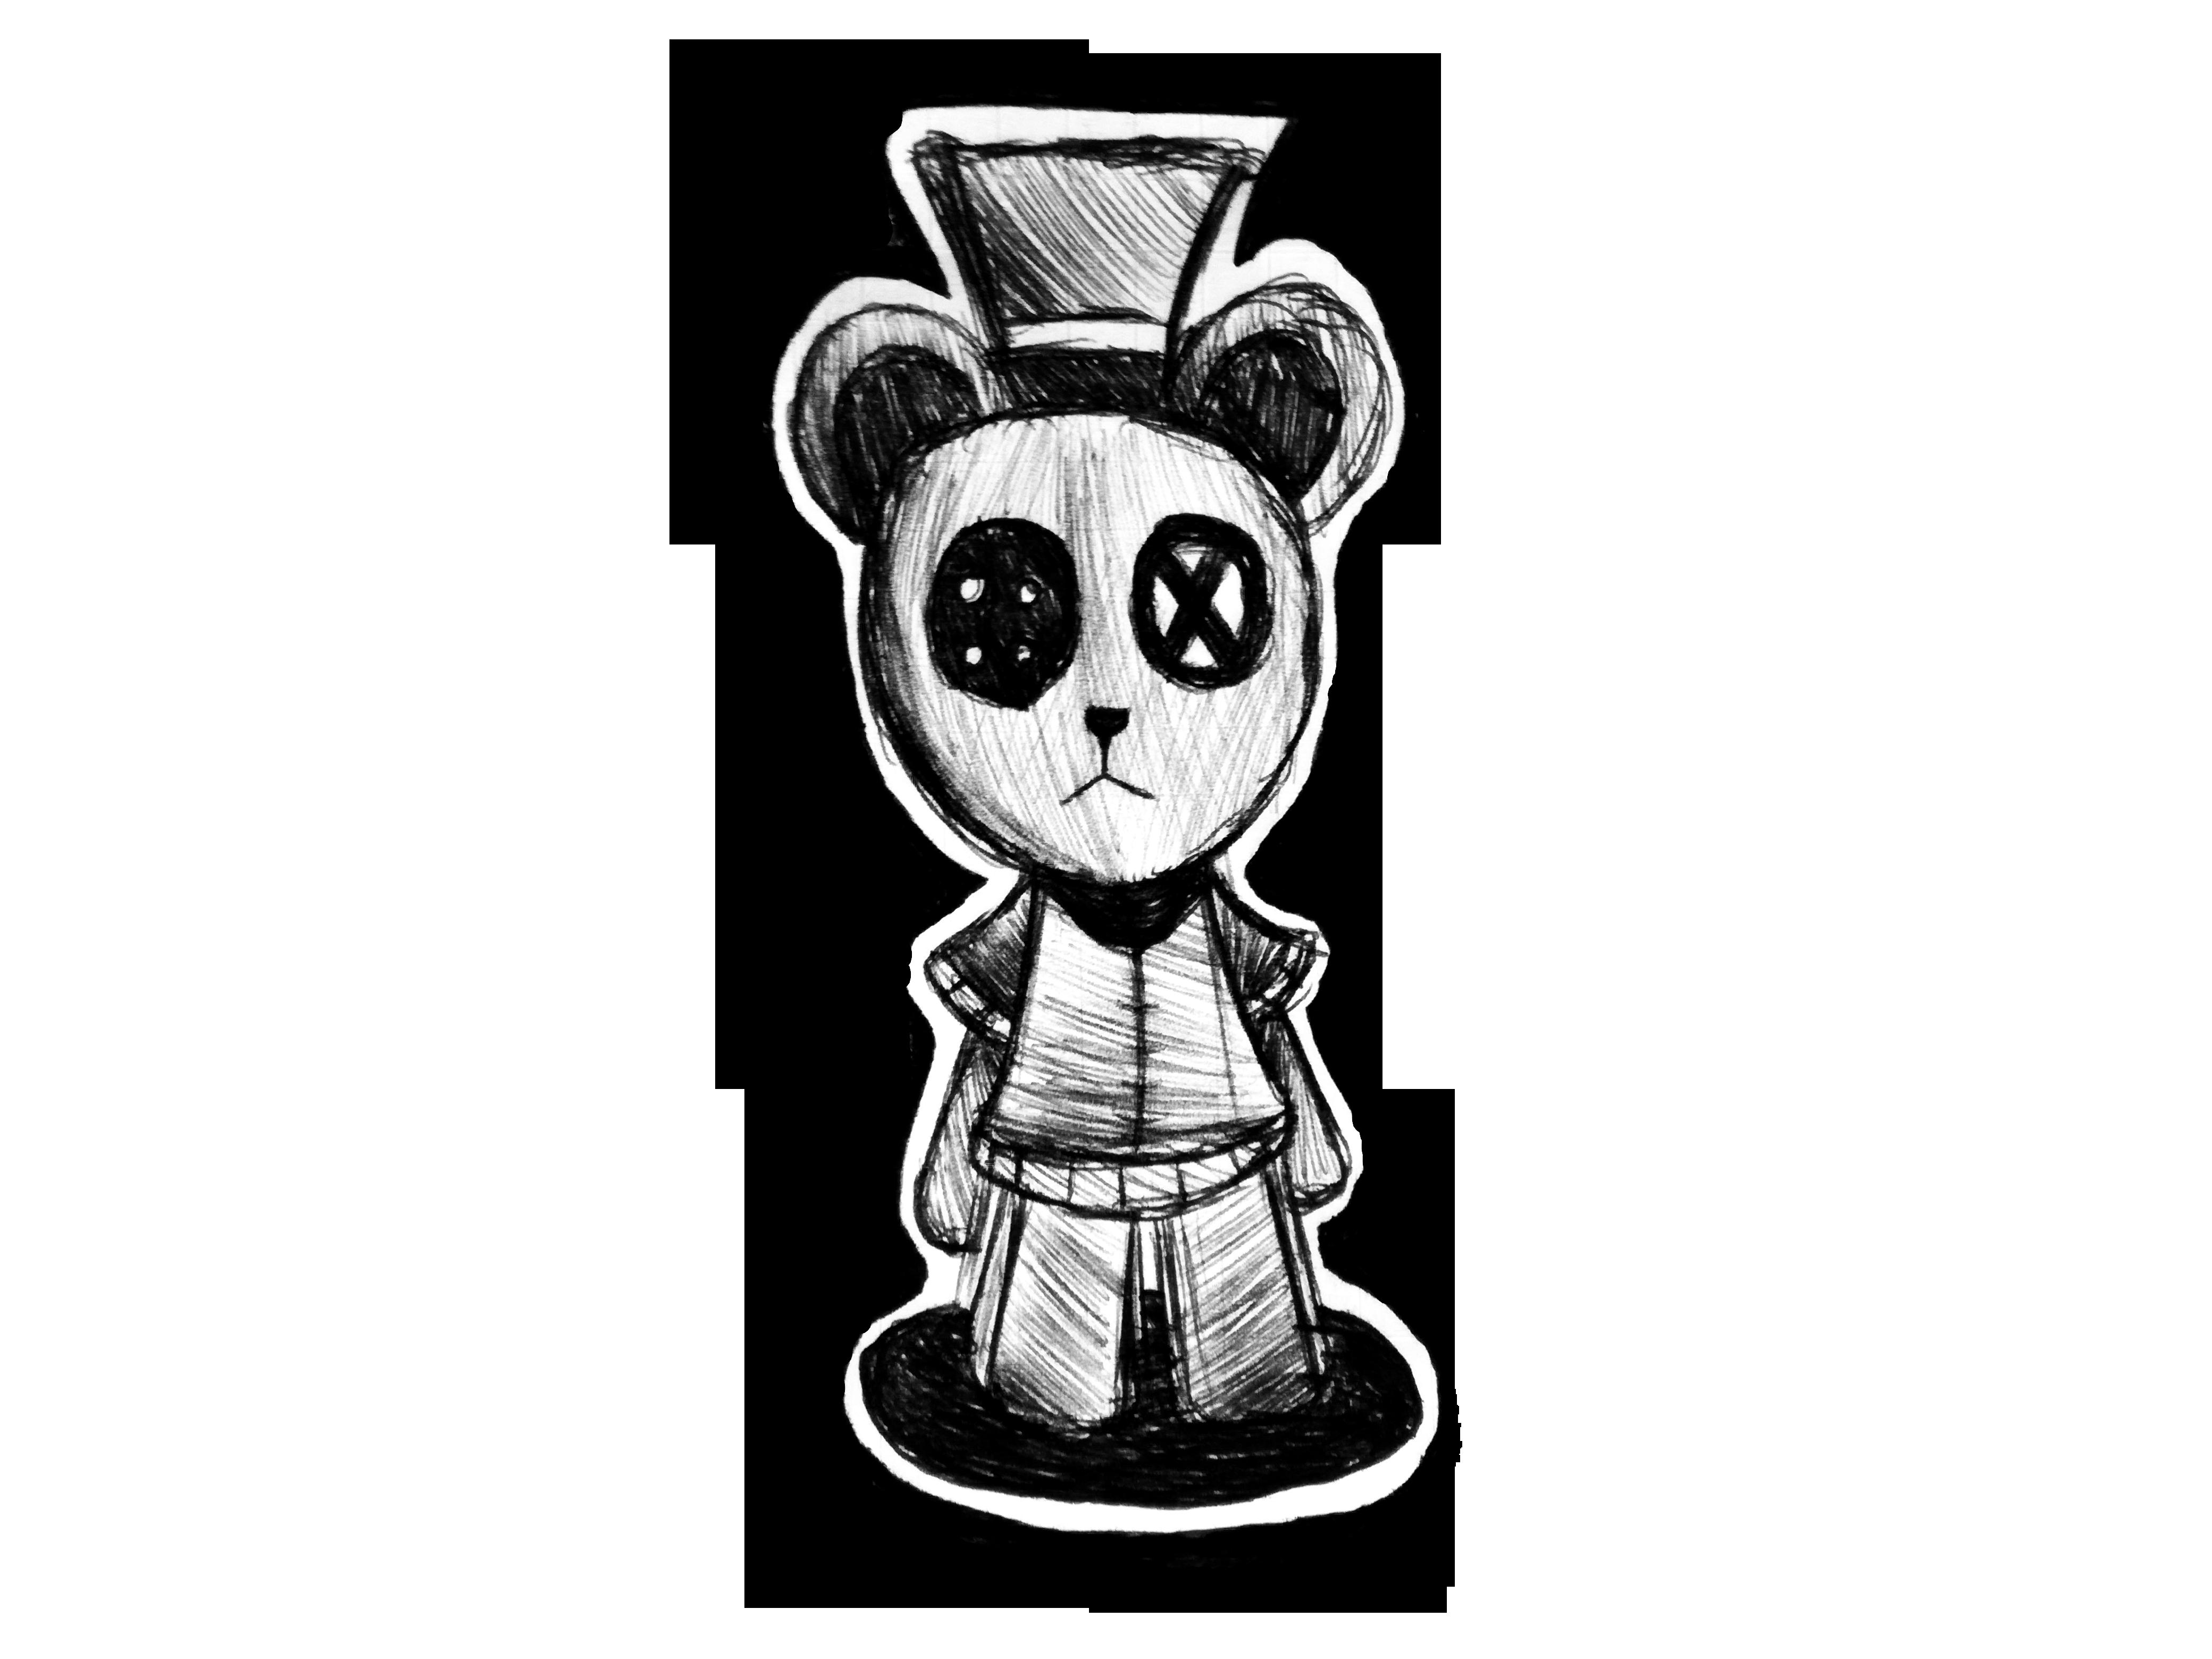 Bear Willy